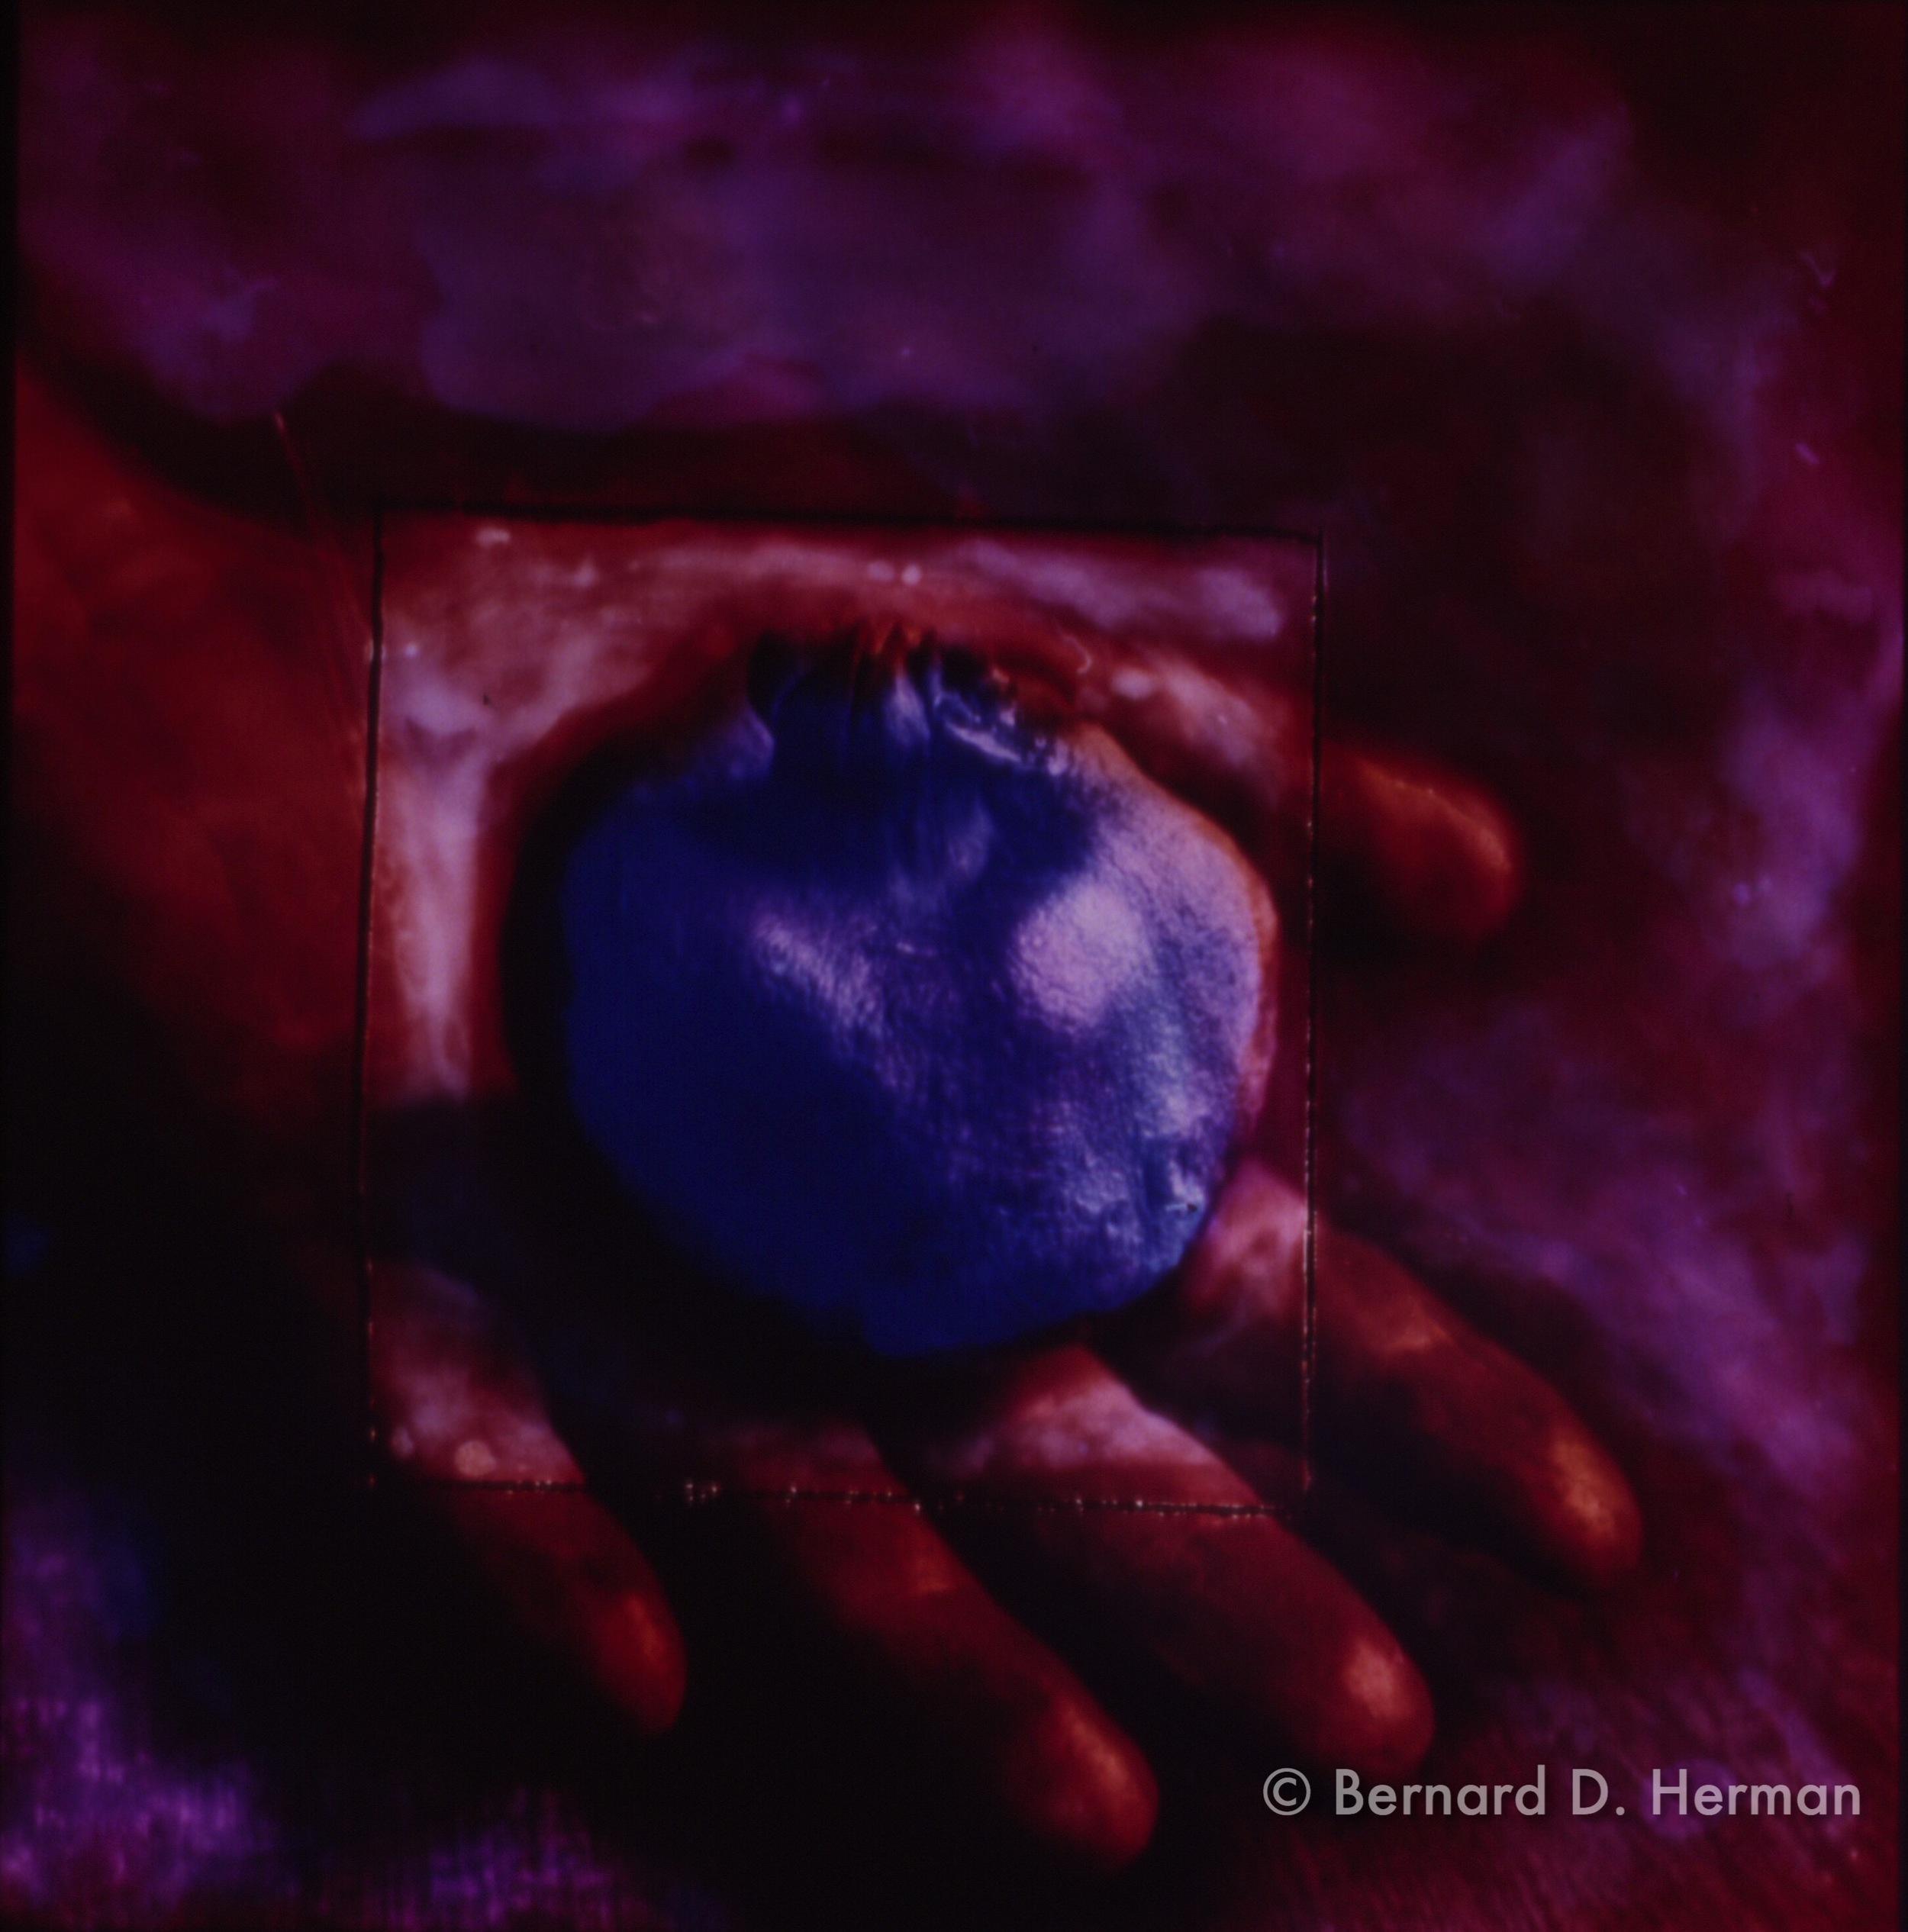 Handful of Blue Pomegranate